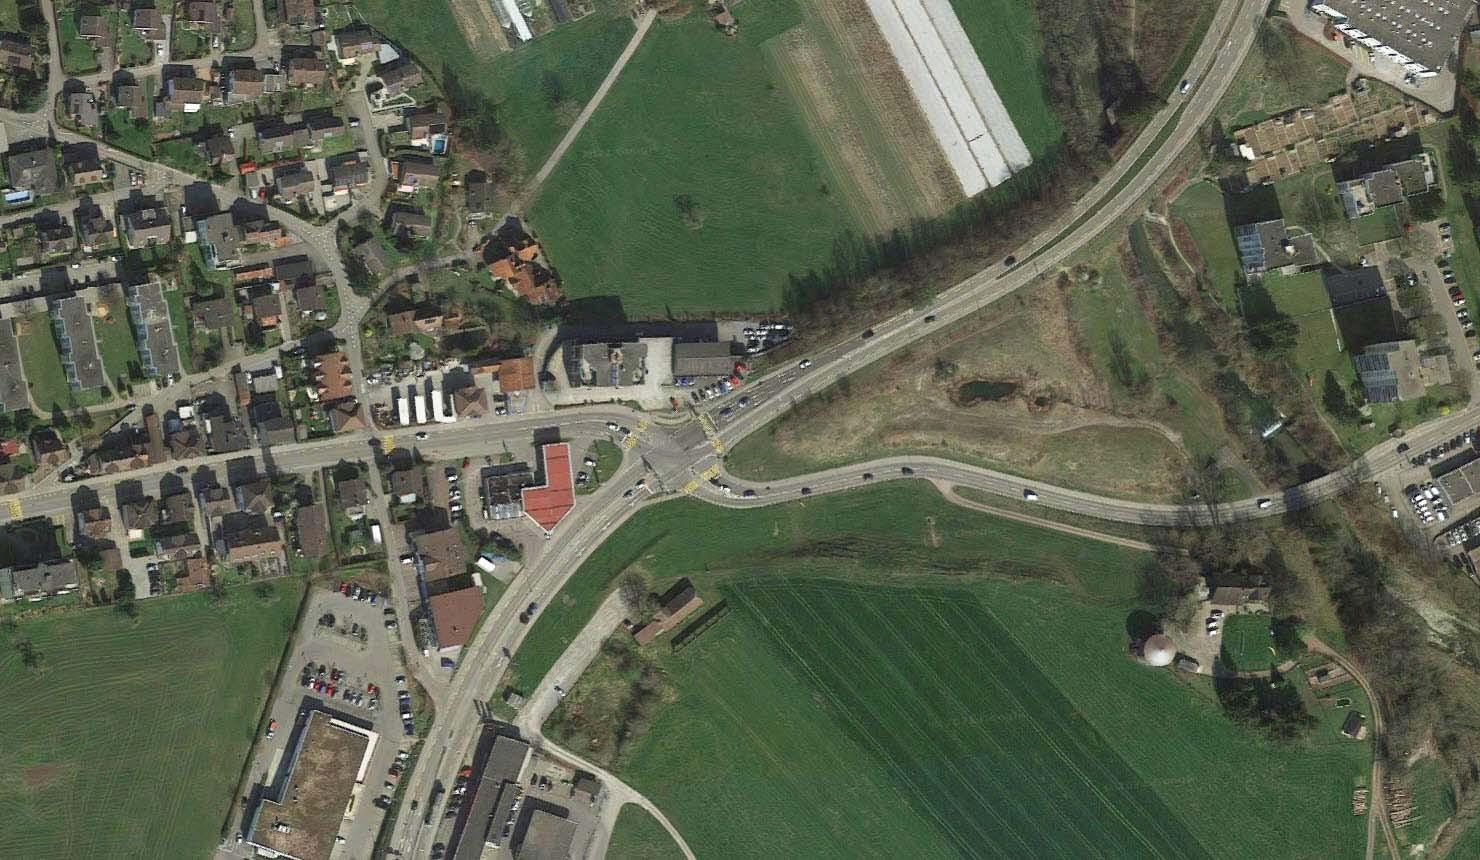 Kreuzung Augarten in Uzwil